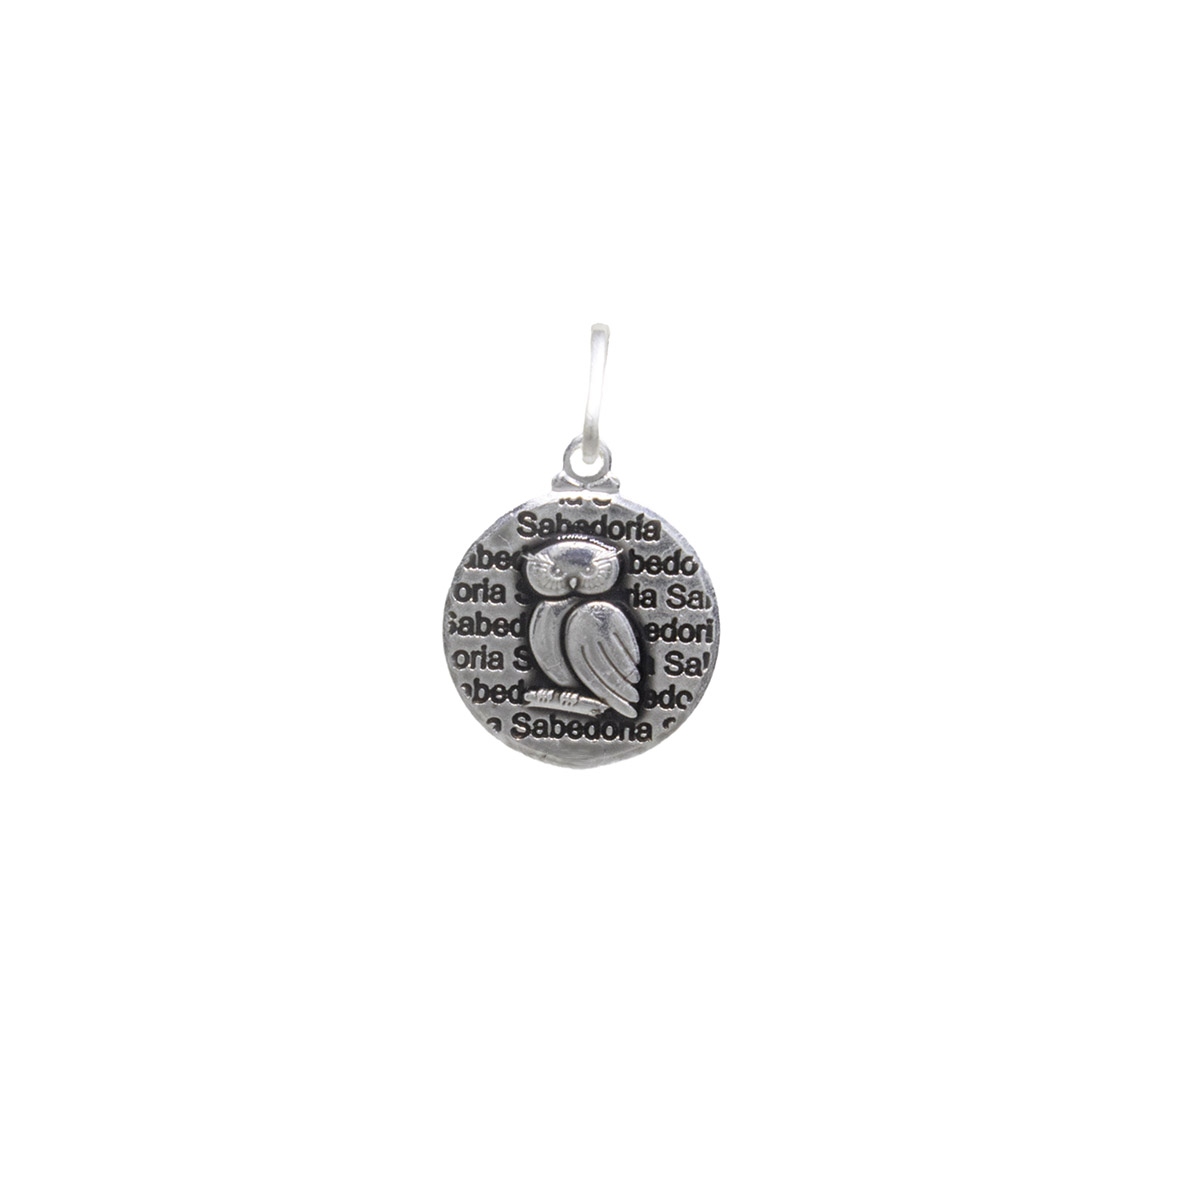 Medalha joia prata 925 Coruja Sabedoria prata envelhecida